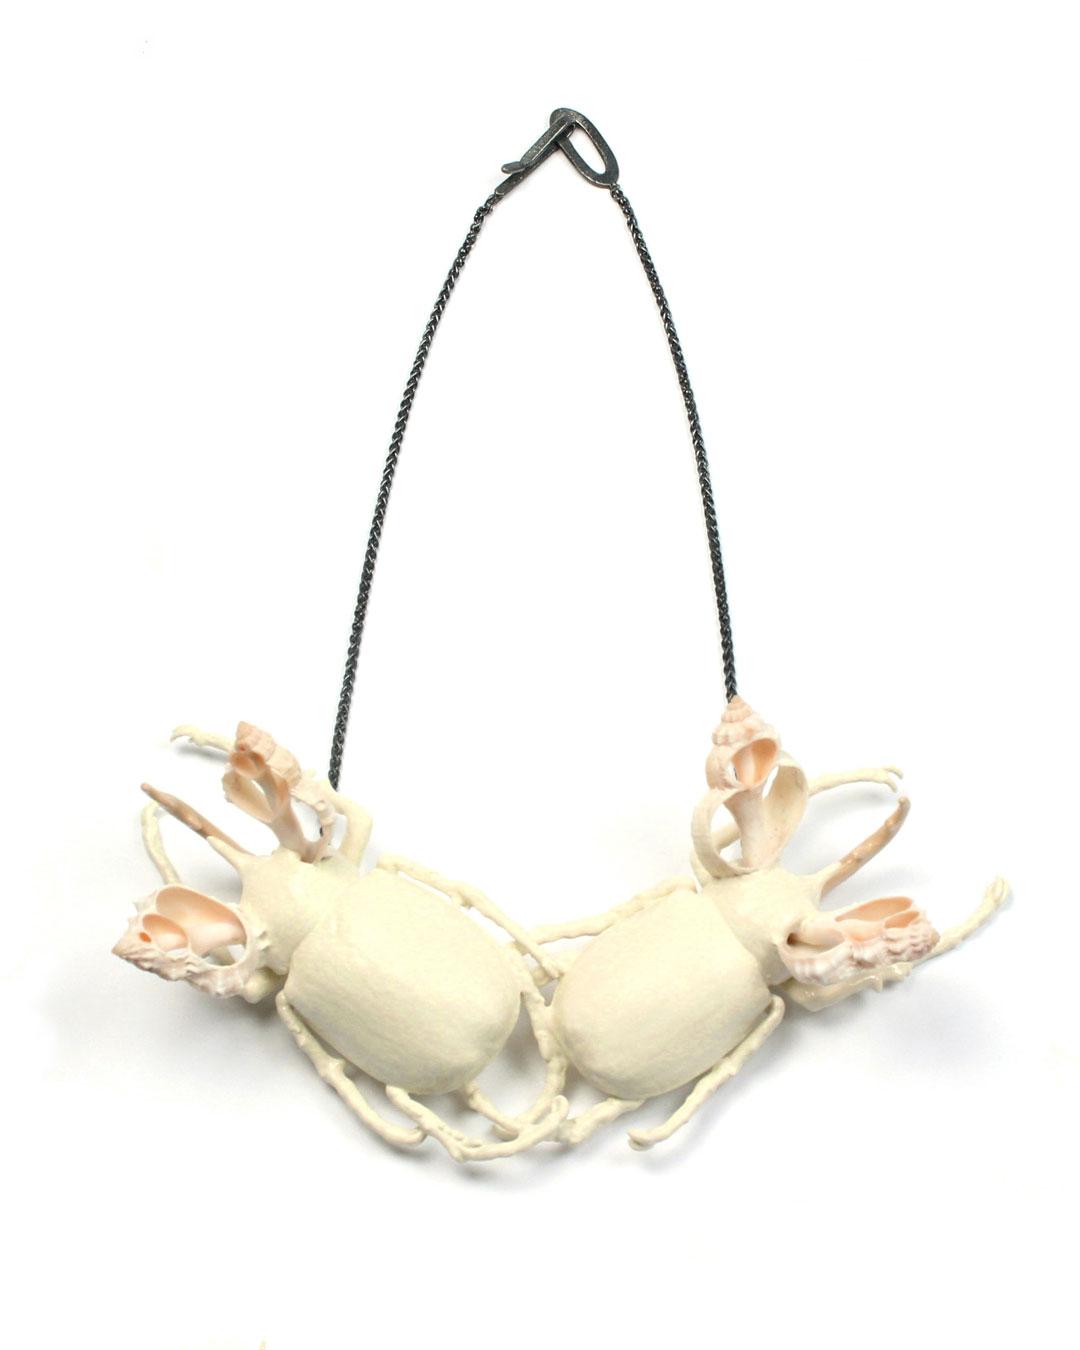 Märta Mattsson, Mermaids, 2019, necklace; beetles, copper, lacquer, resin, seashells, silver, 200 x 250 x 60 mm, €3150